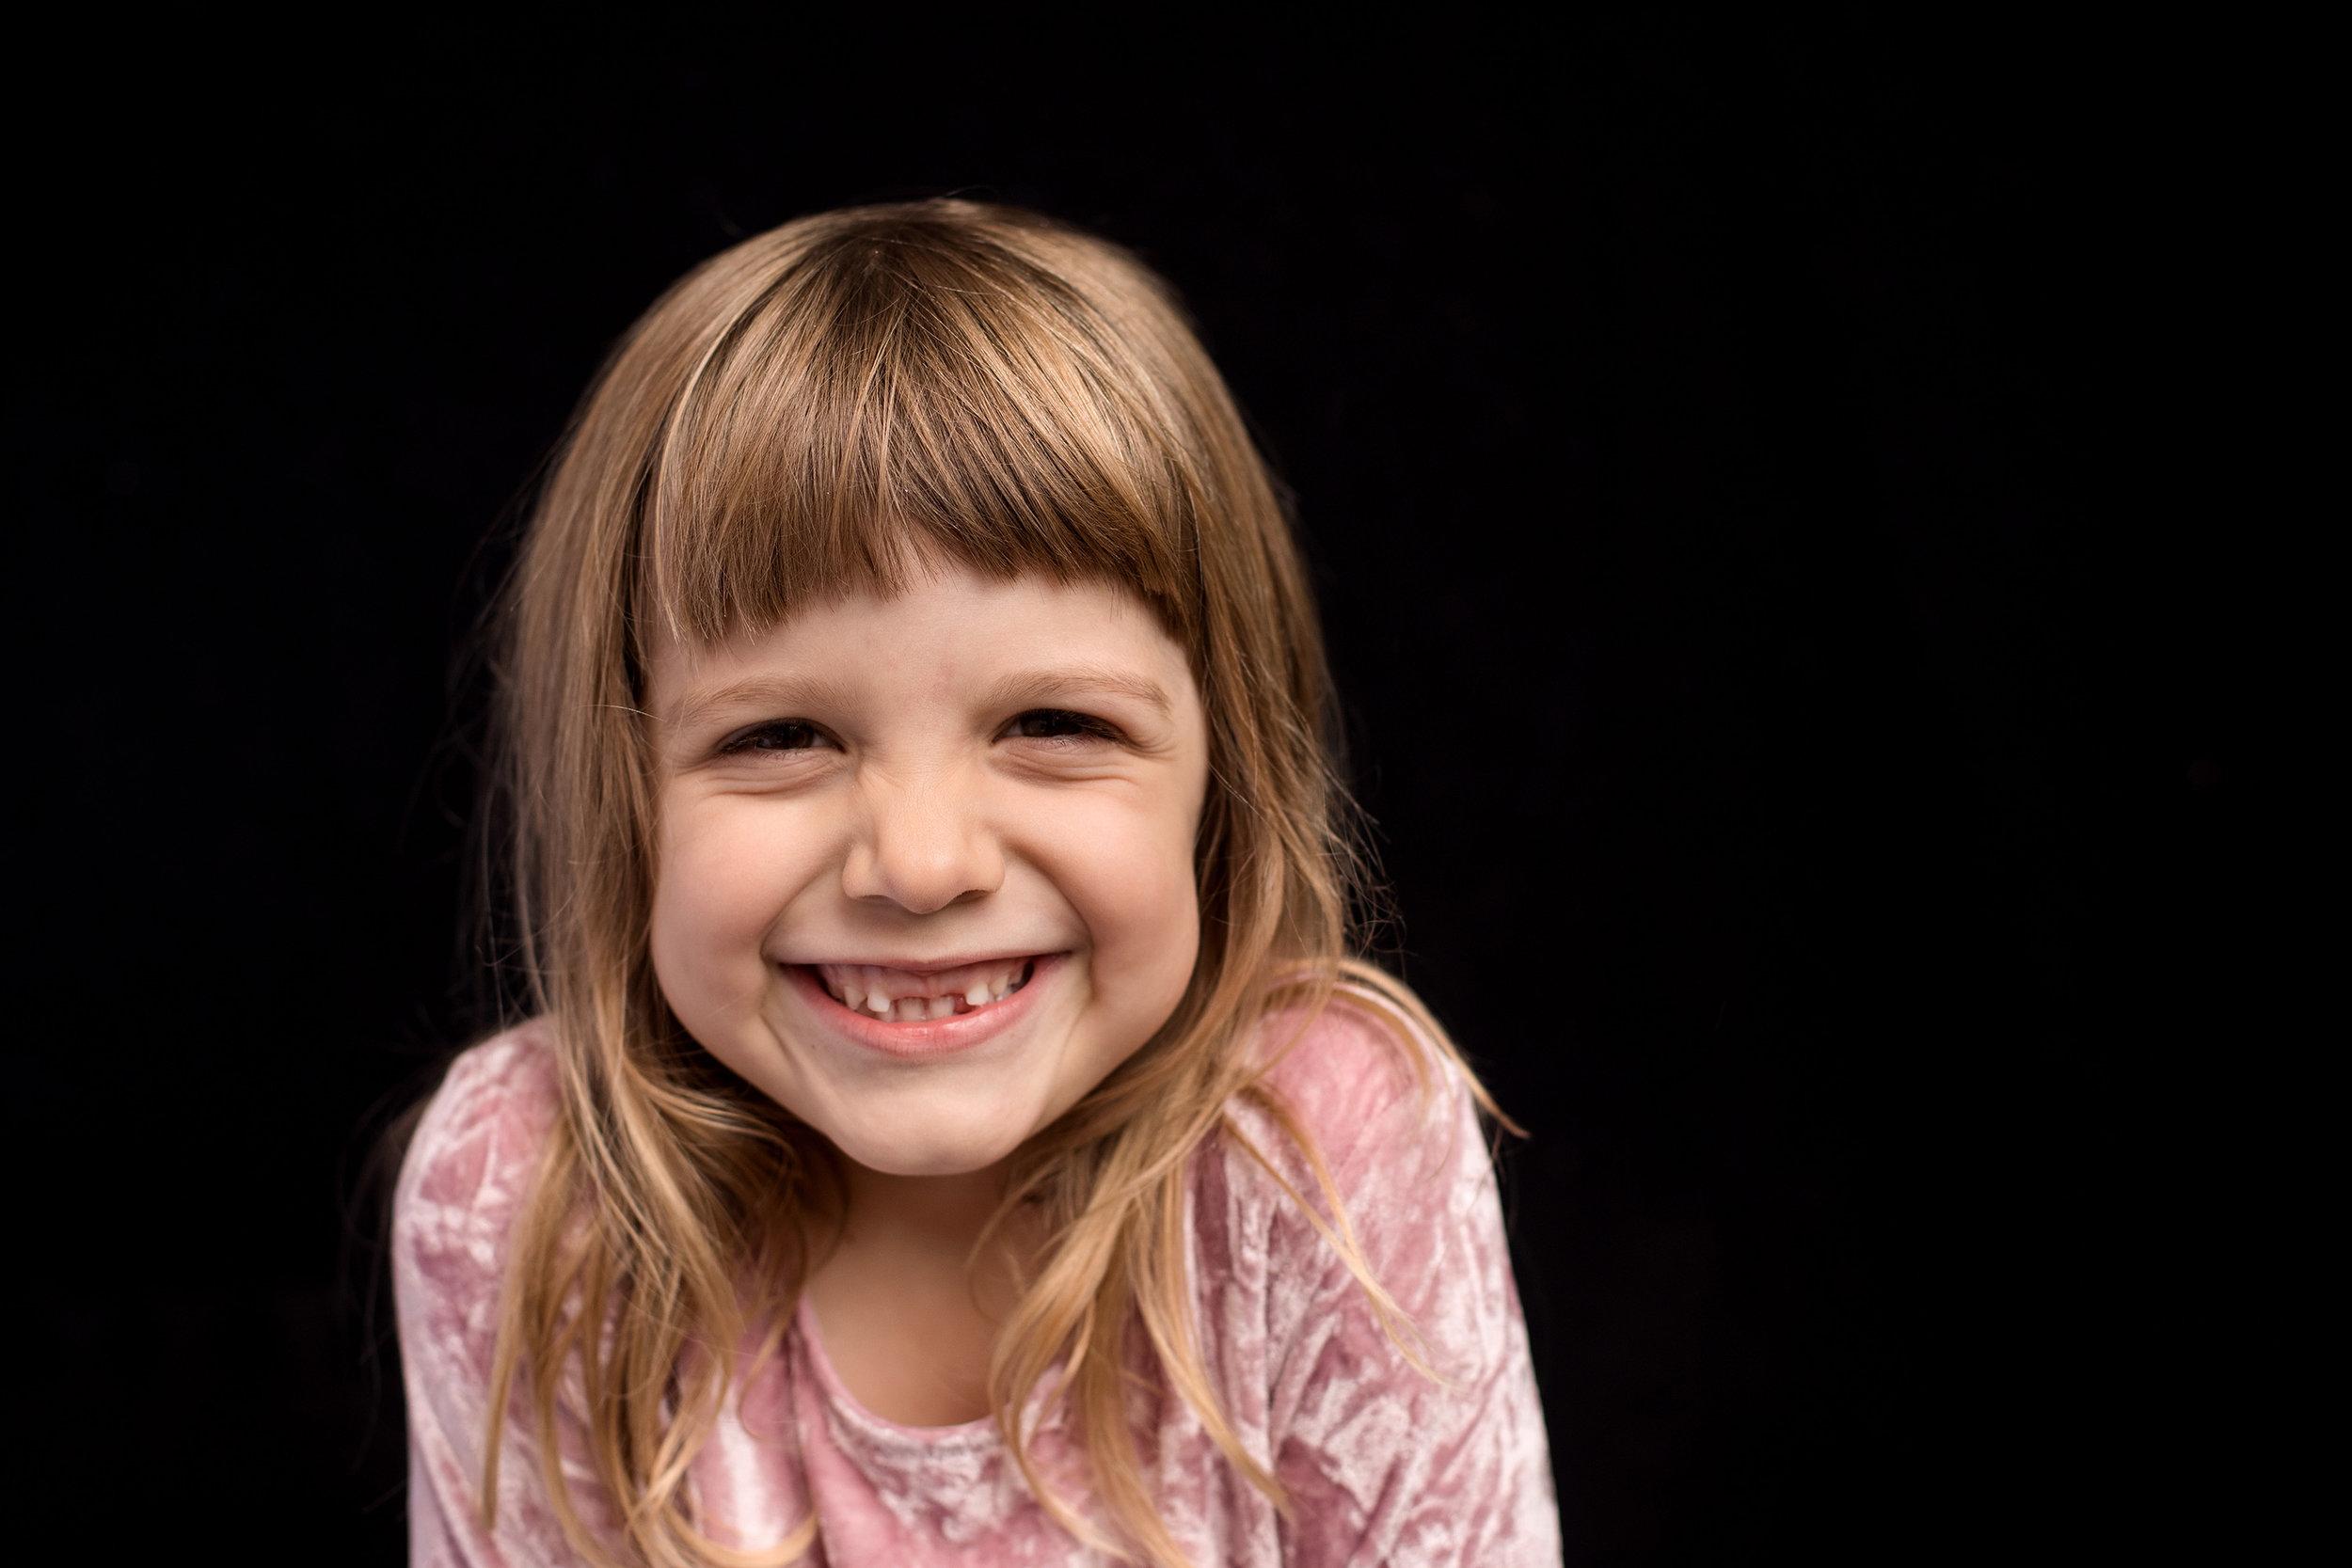 happy smiling girl during her modern school portrait